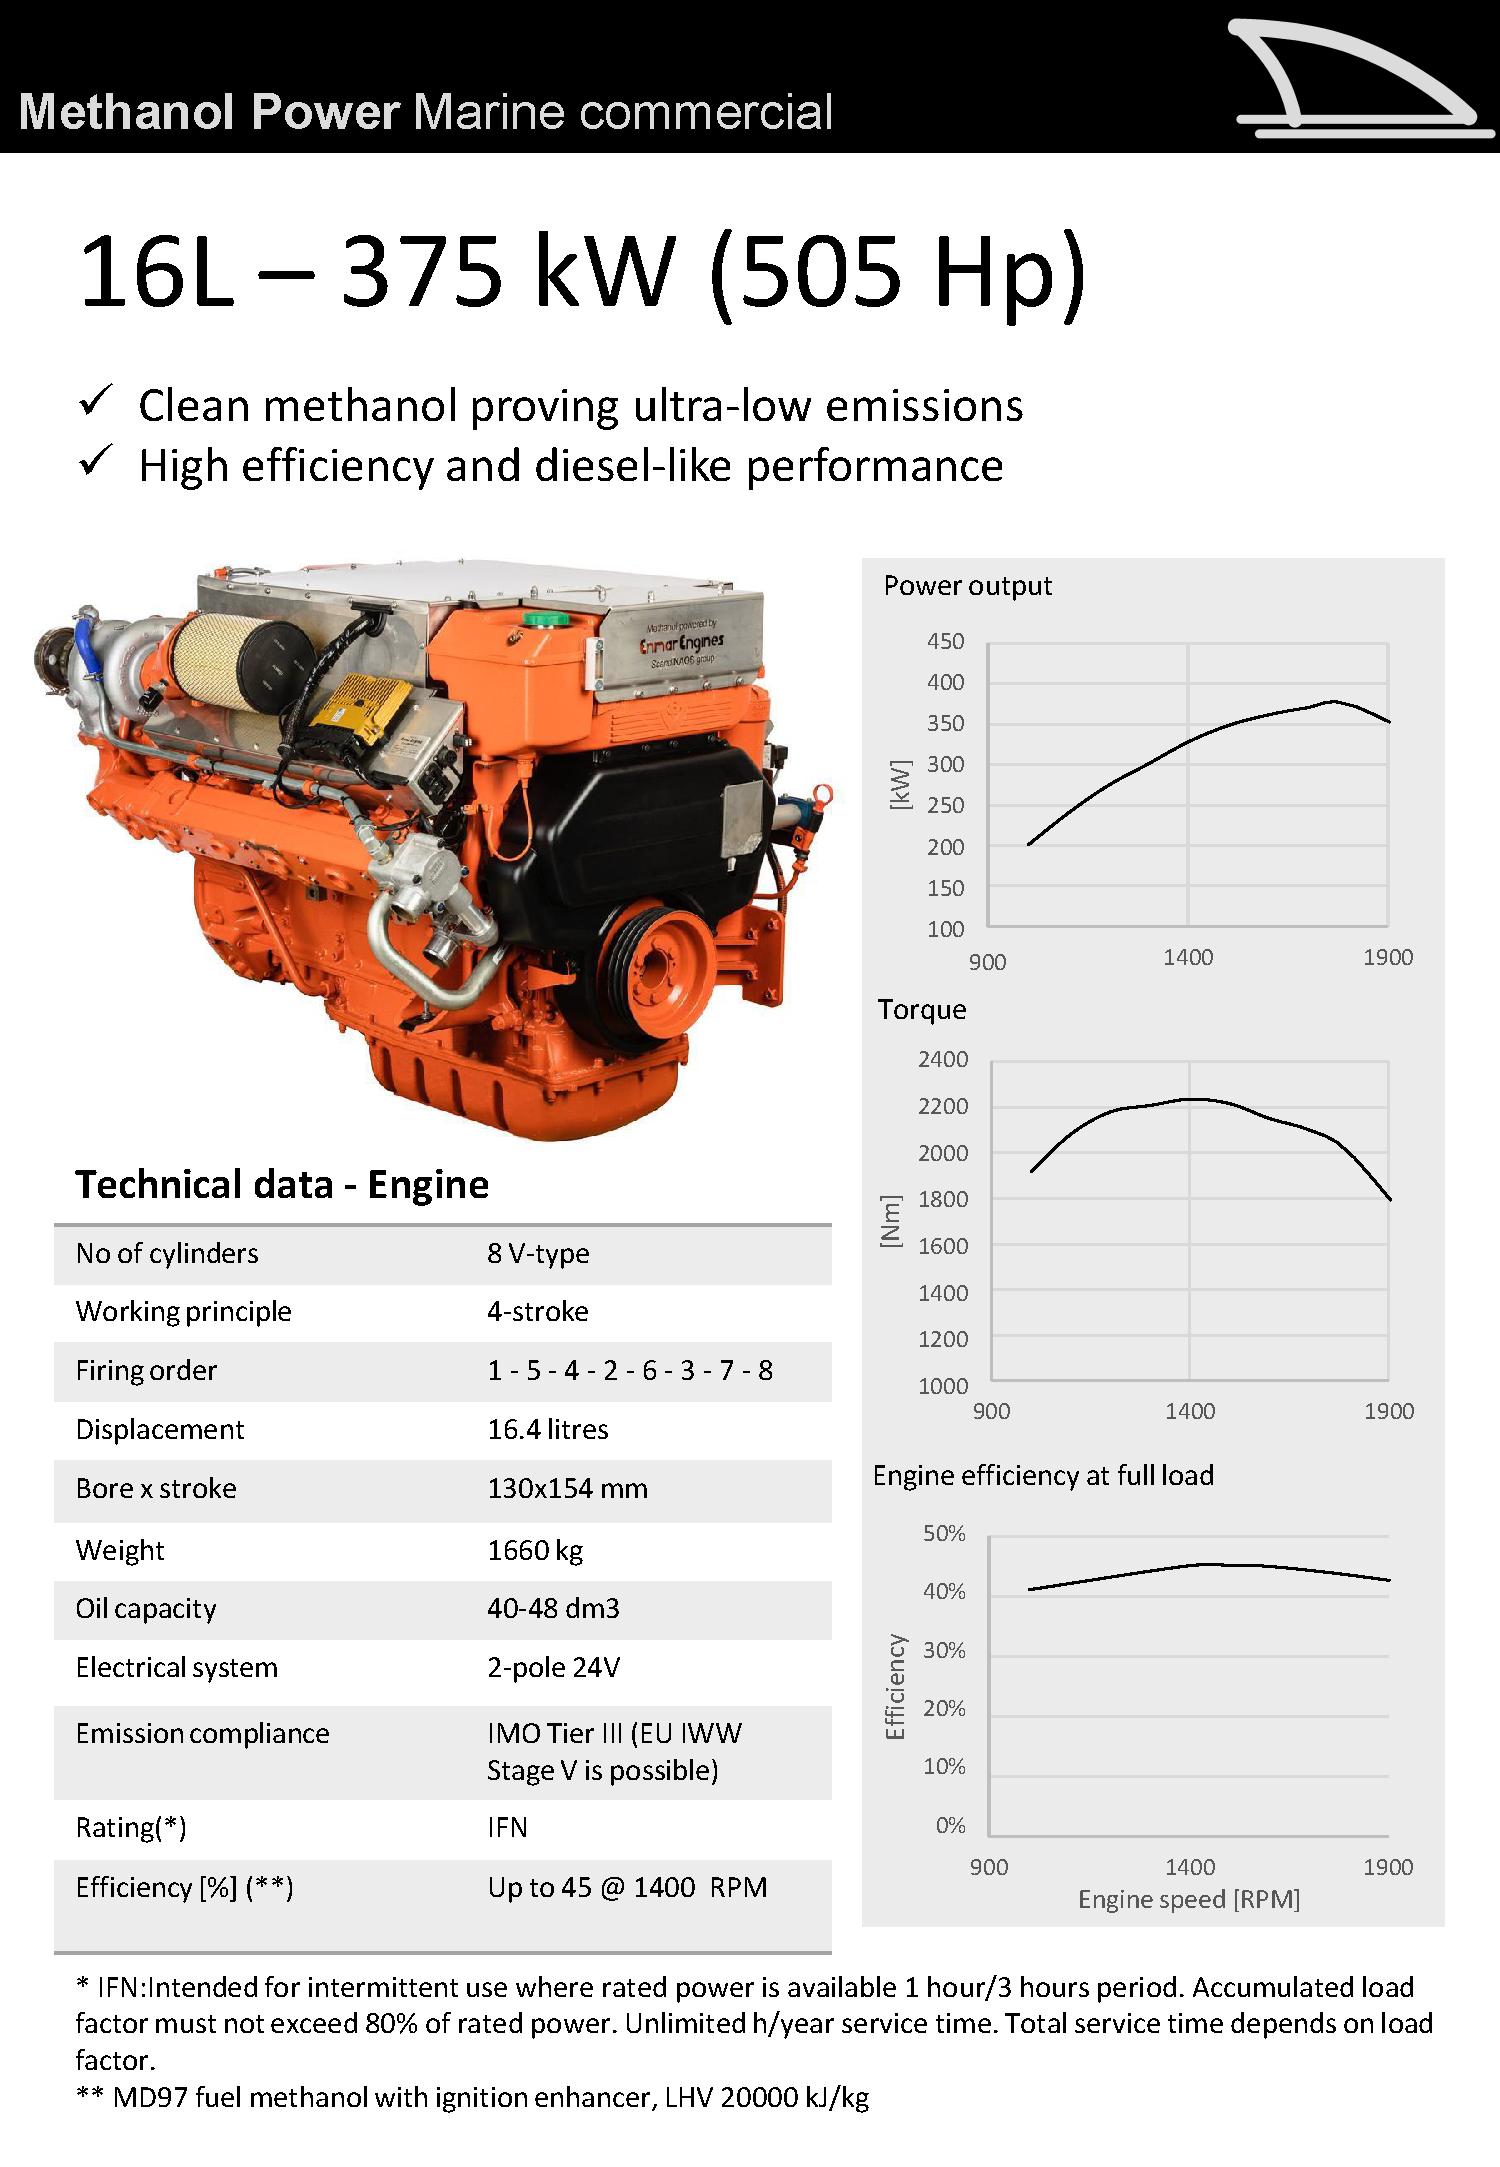 Metanol 16L - 375 kW (505 Hp)